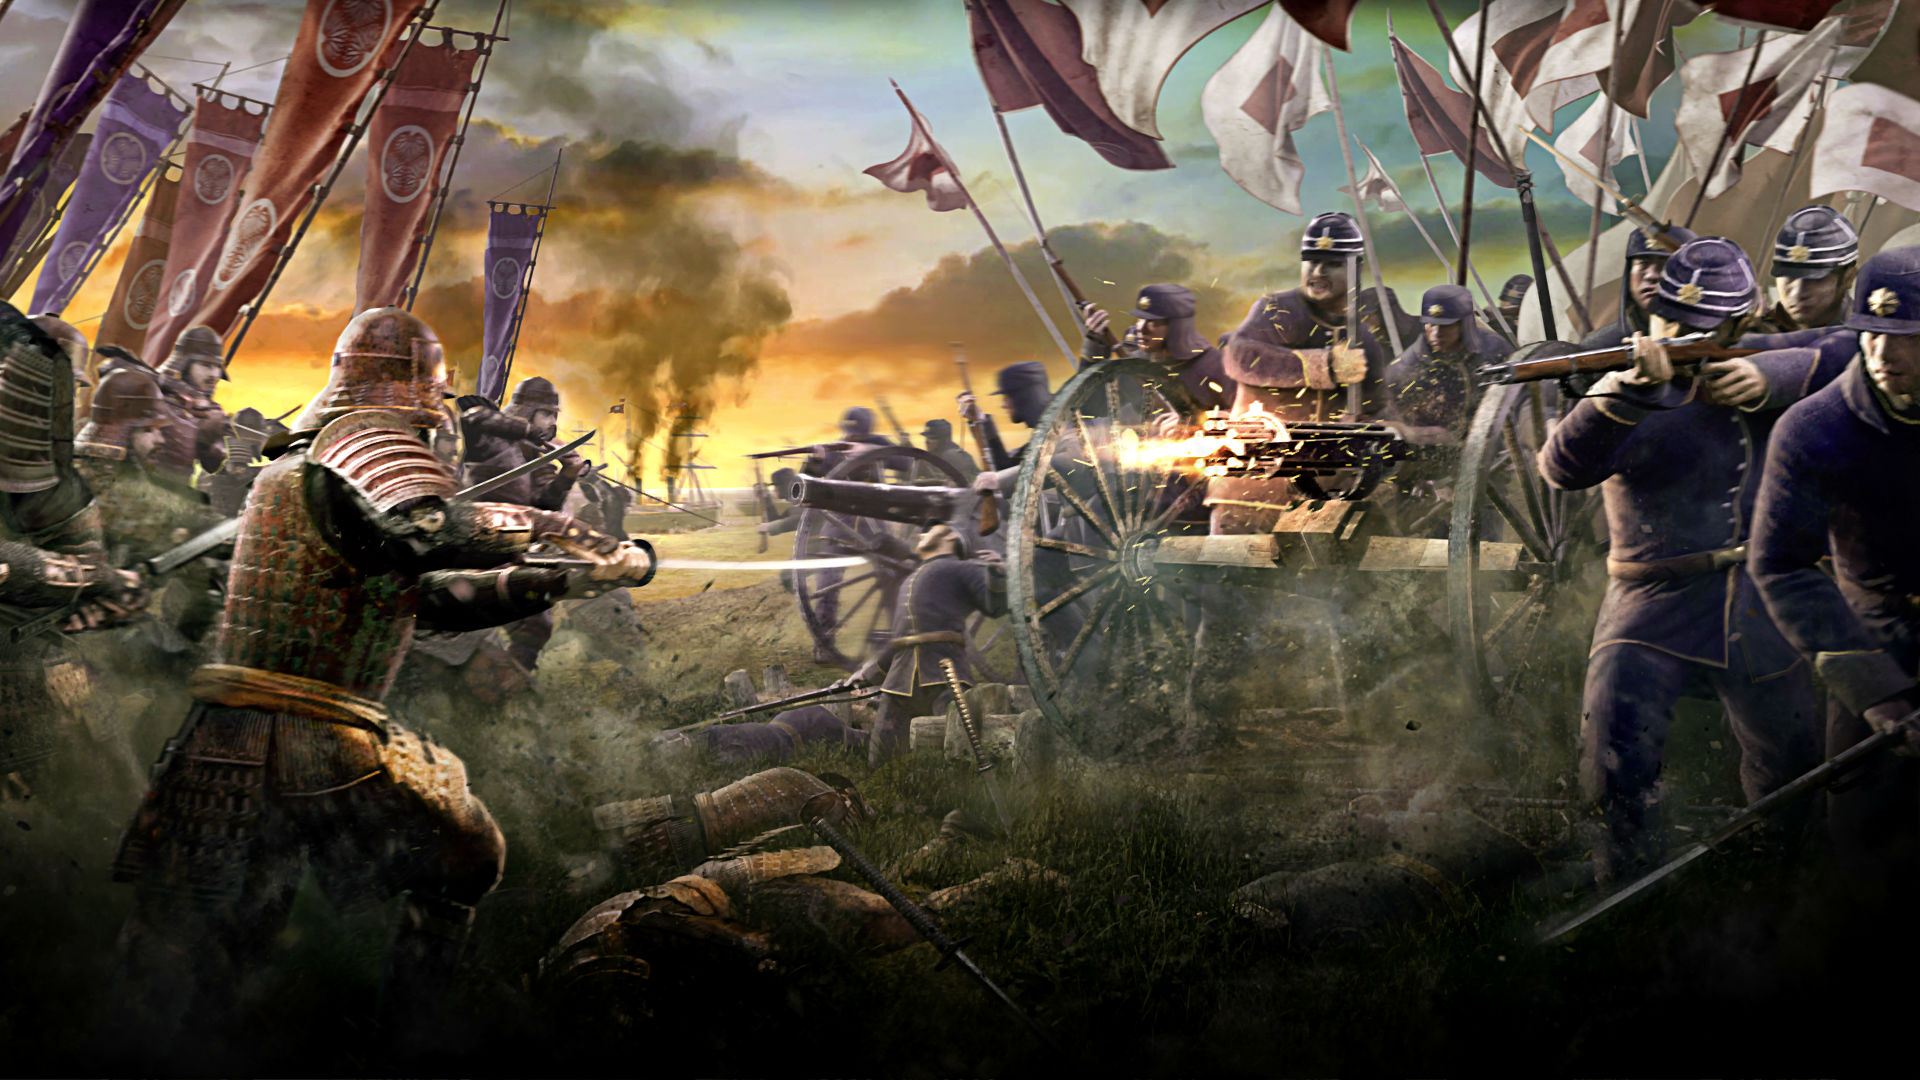 Total War Shogun 2 Fall Of The Samurai Wallpaper Hd Total War Shogun 2 Rise Of The Samurai Fondos De